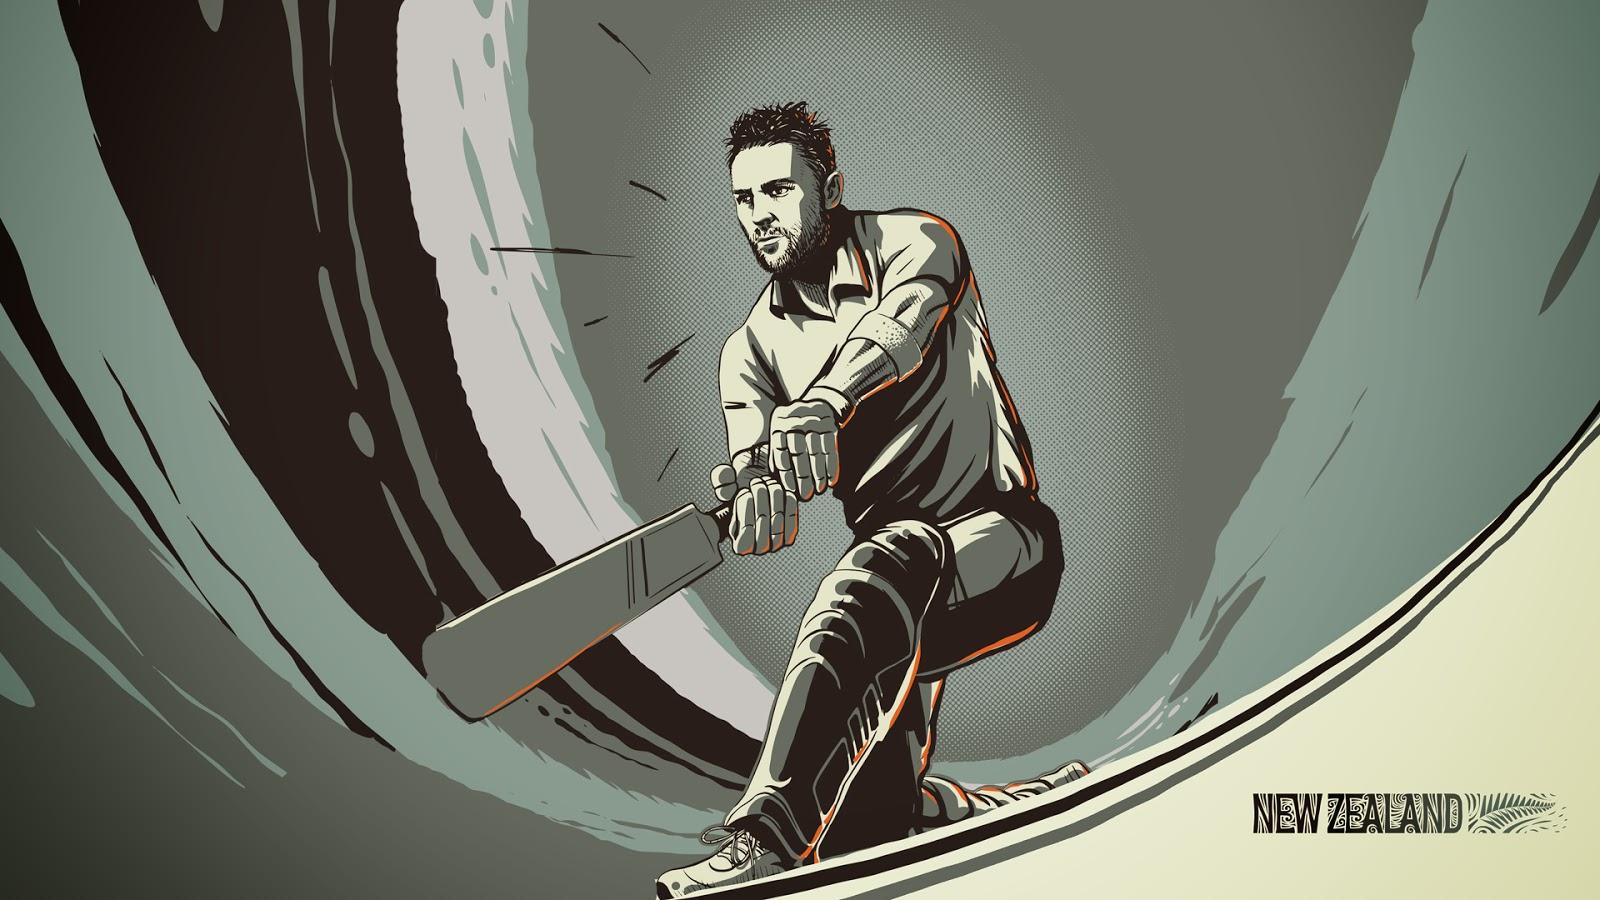 Brendon McCullum New Zealand cricketer illustration sketch